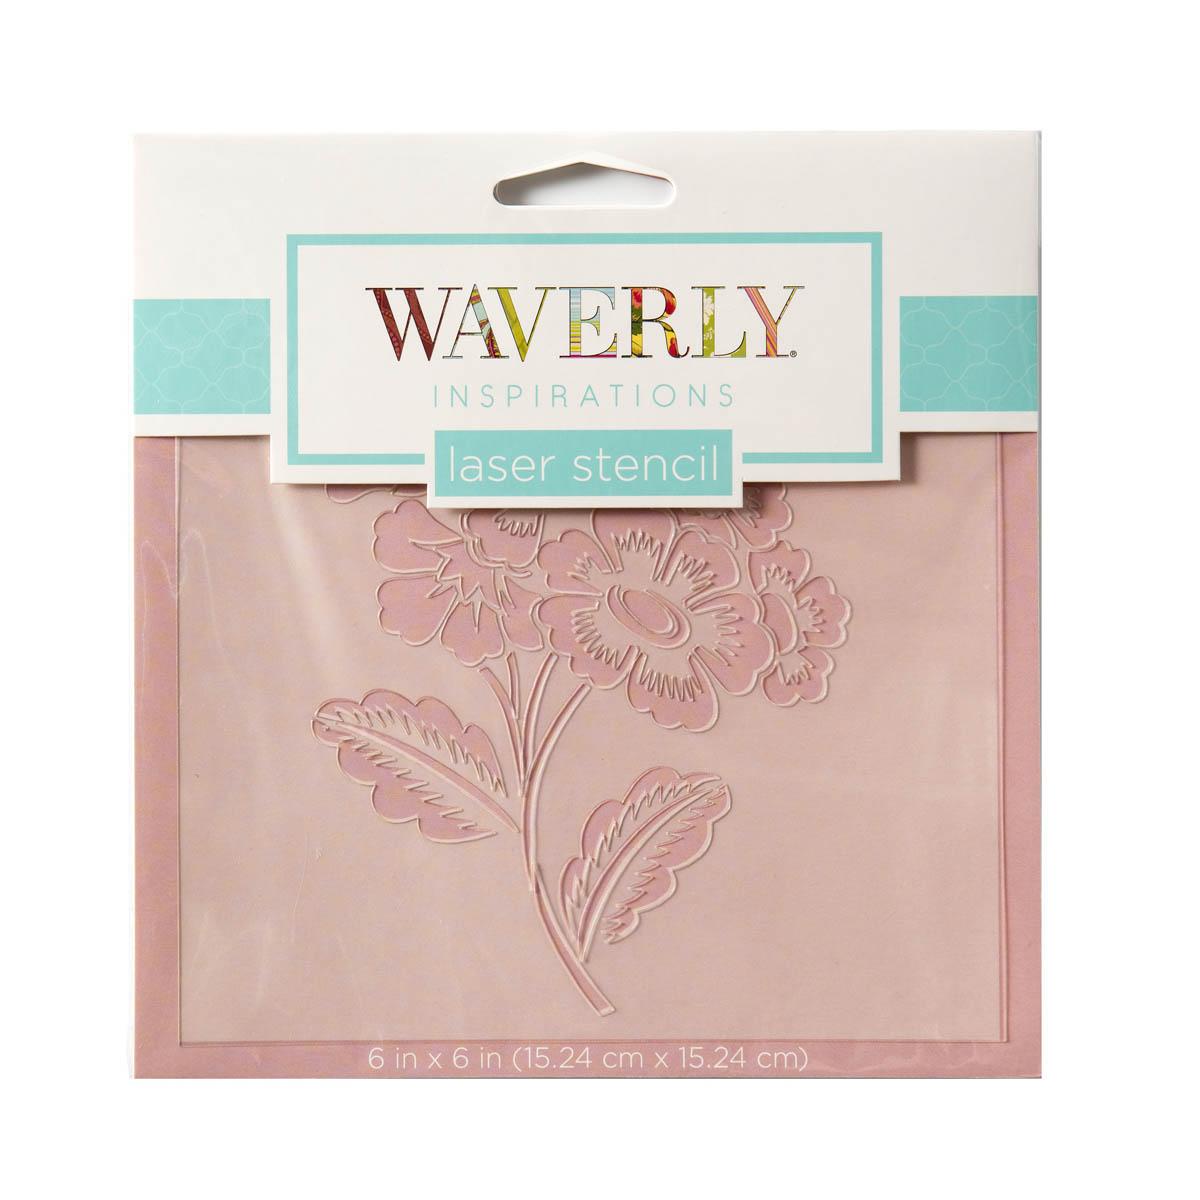 Waverly ® Inspirations Laser Stencils - Accent - Floral Sprig, 6